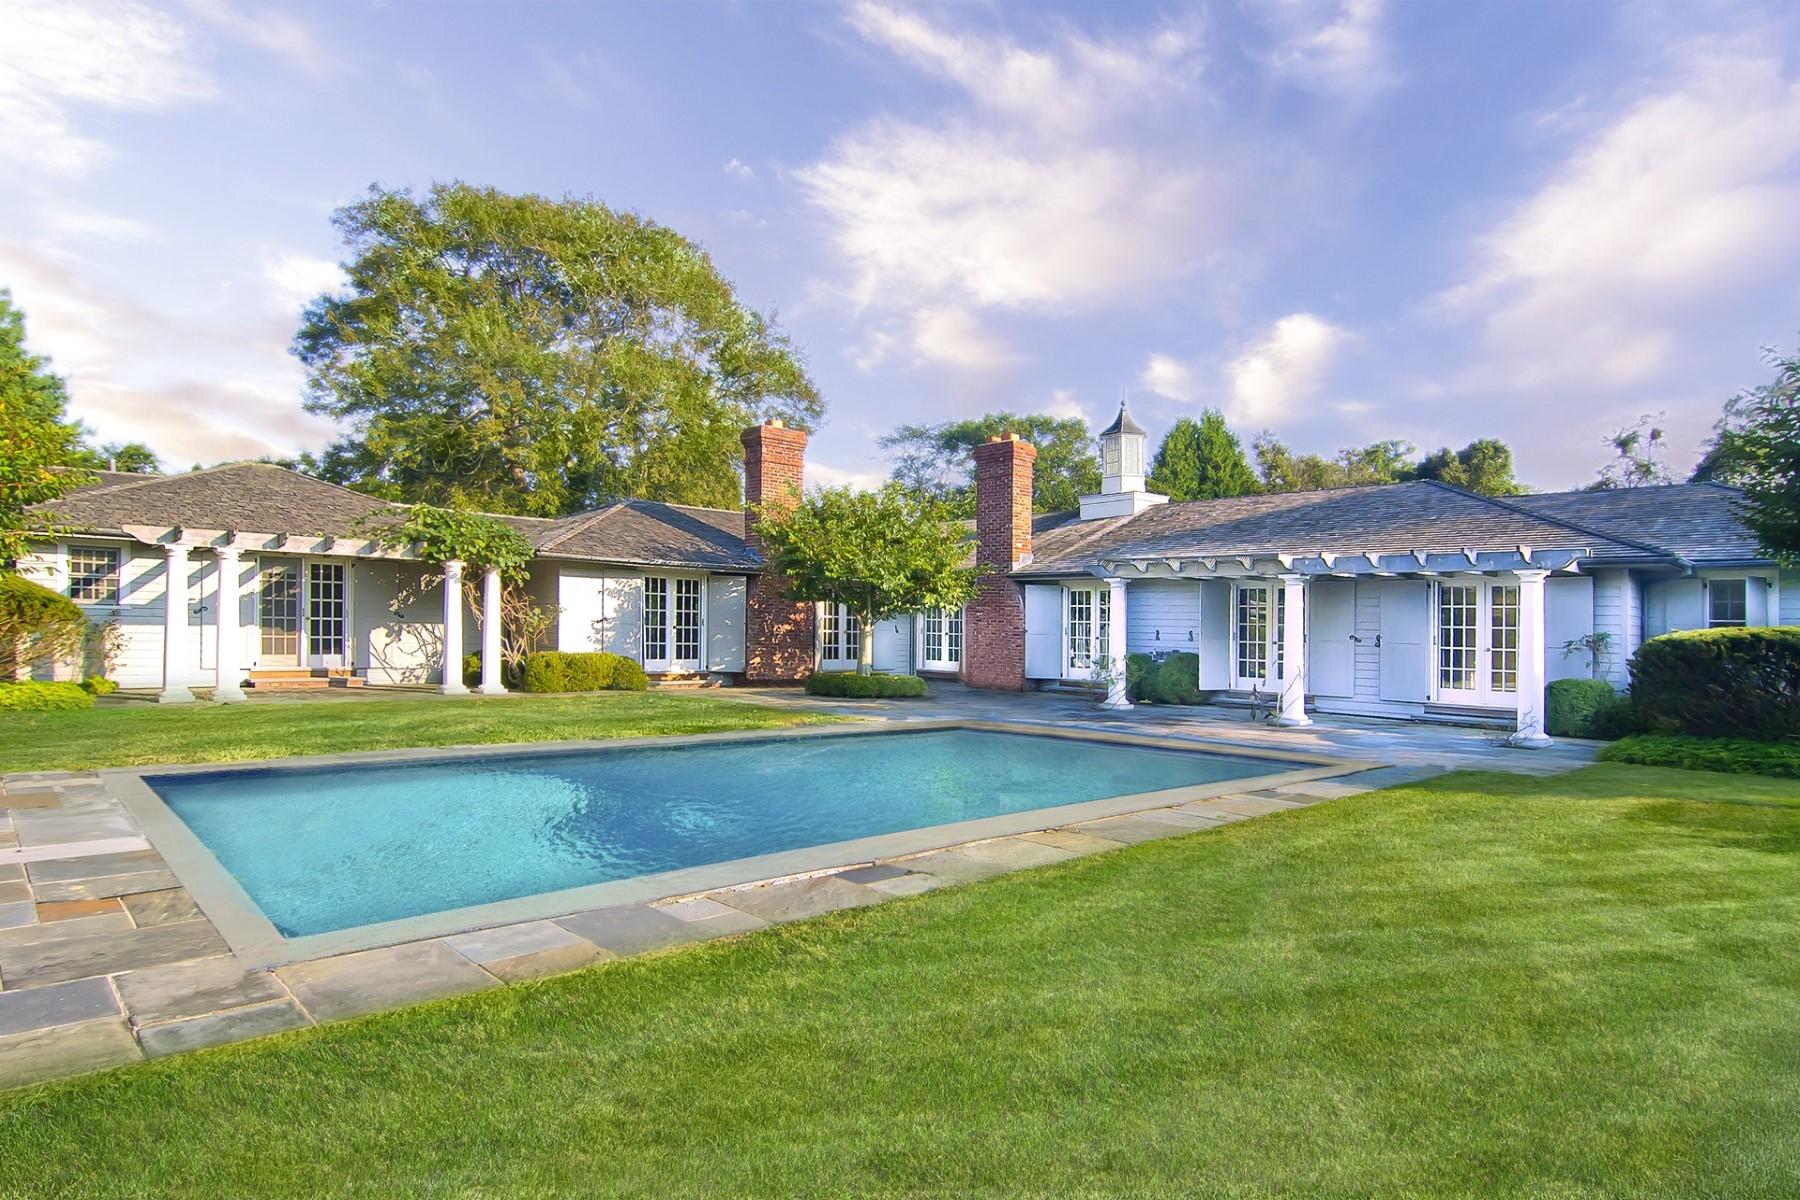 Single Family Home for Rent at East Hampton Village Living 70 Woods Lane East Hampton Village, East Hampton, New York 11937 United States